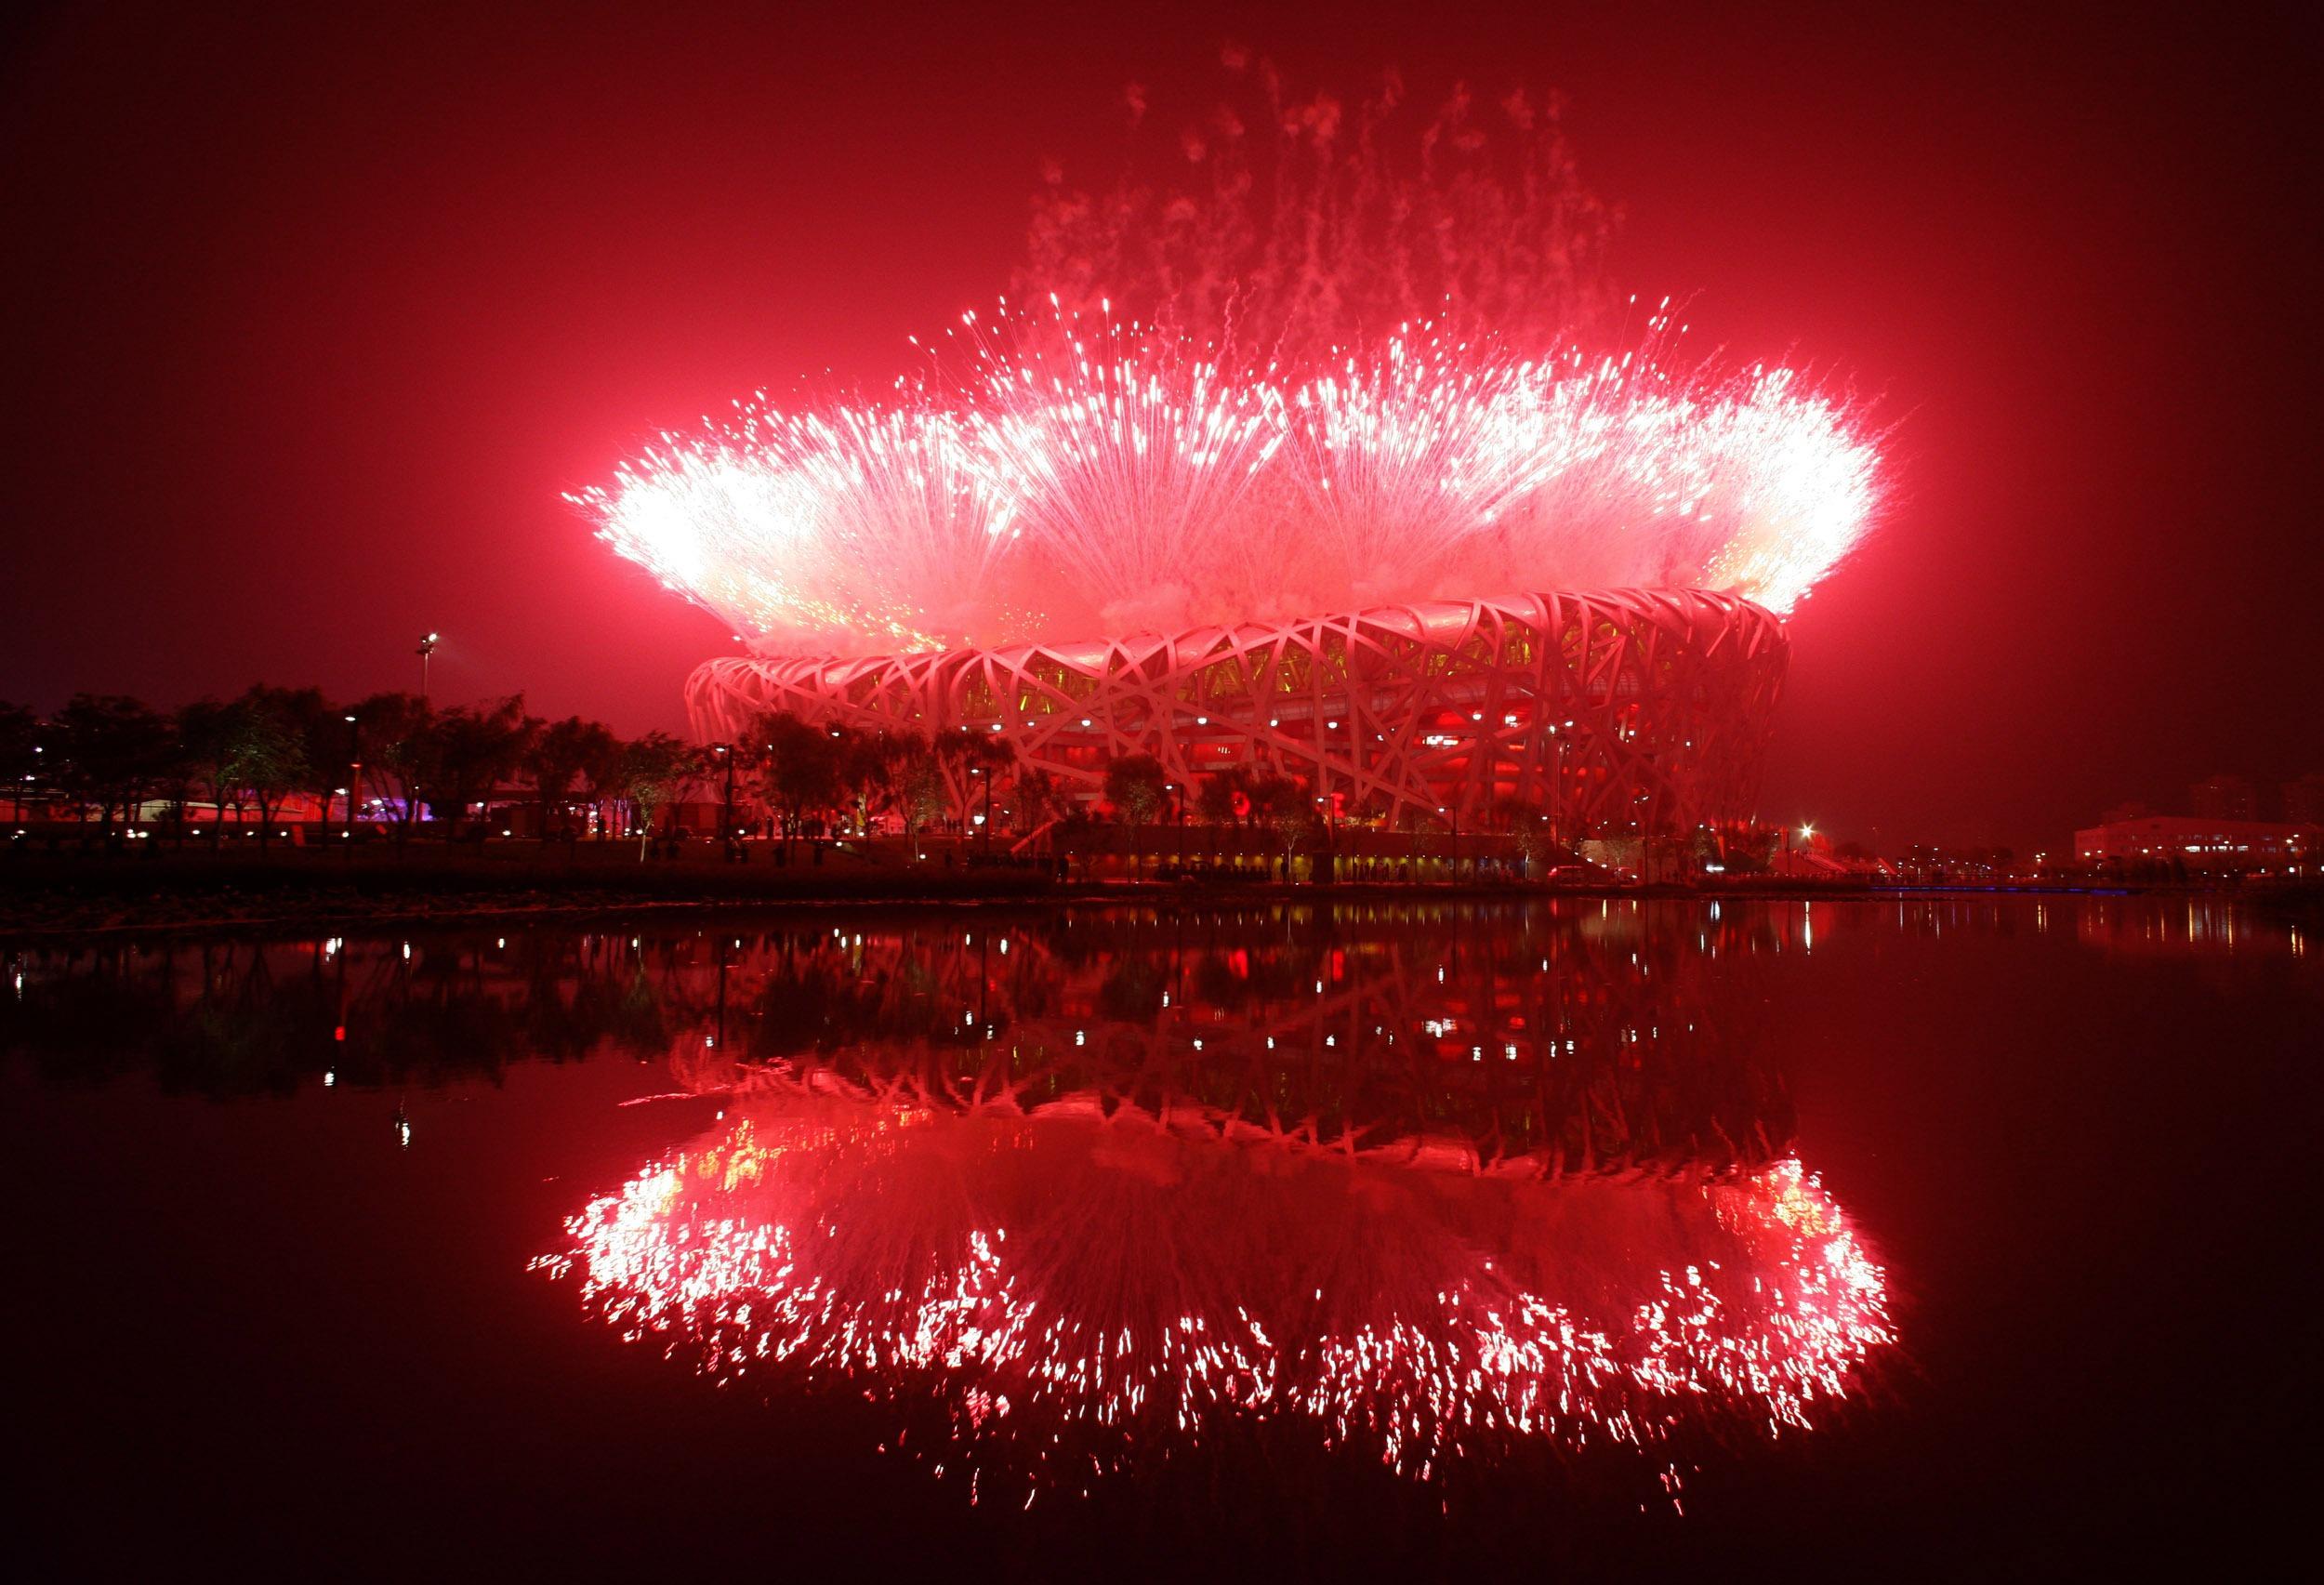 Over 4 billion people watch Beijing Olympics opening ceremony